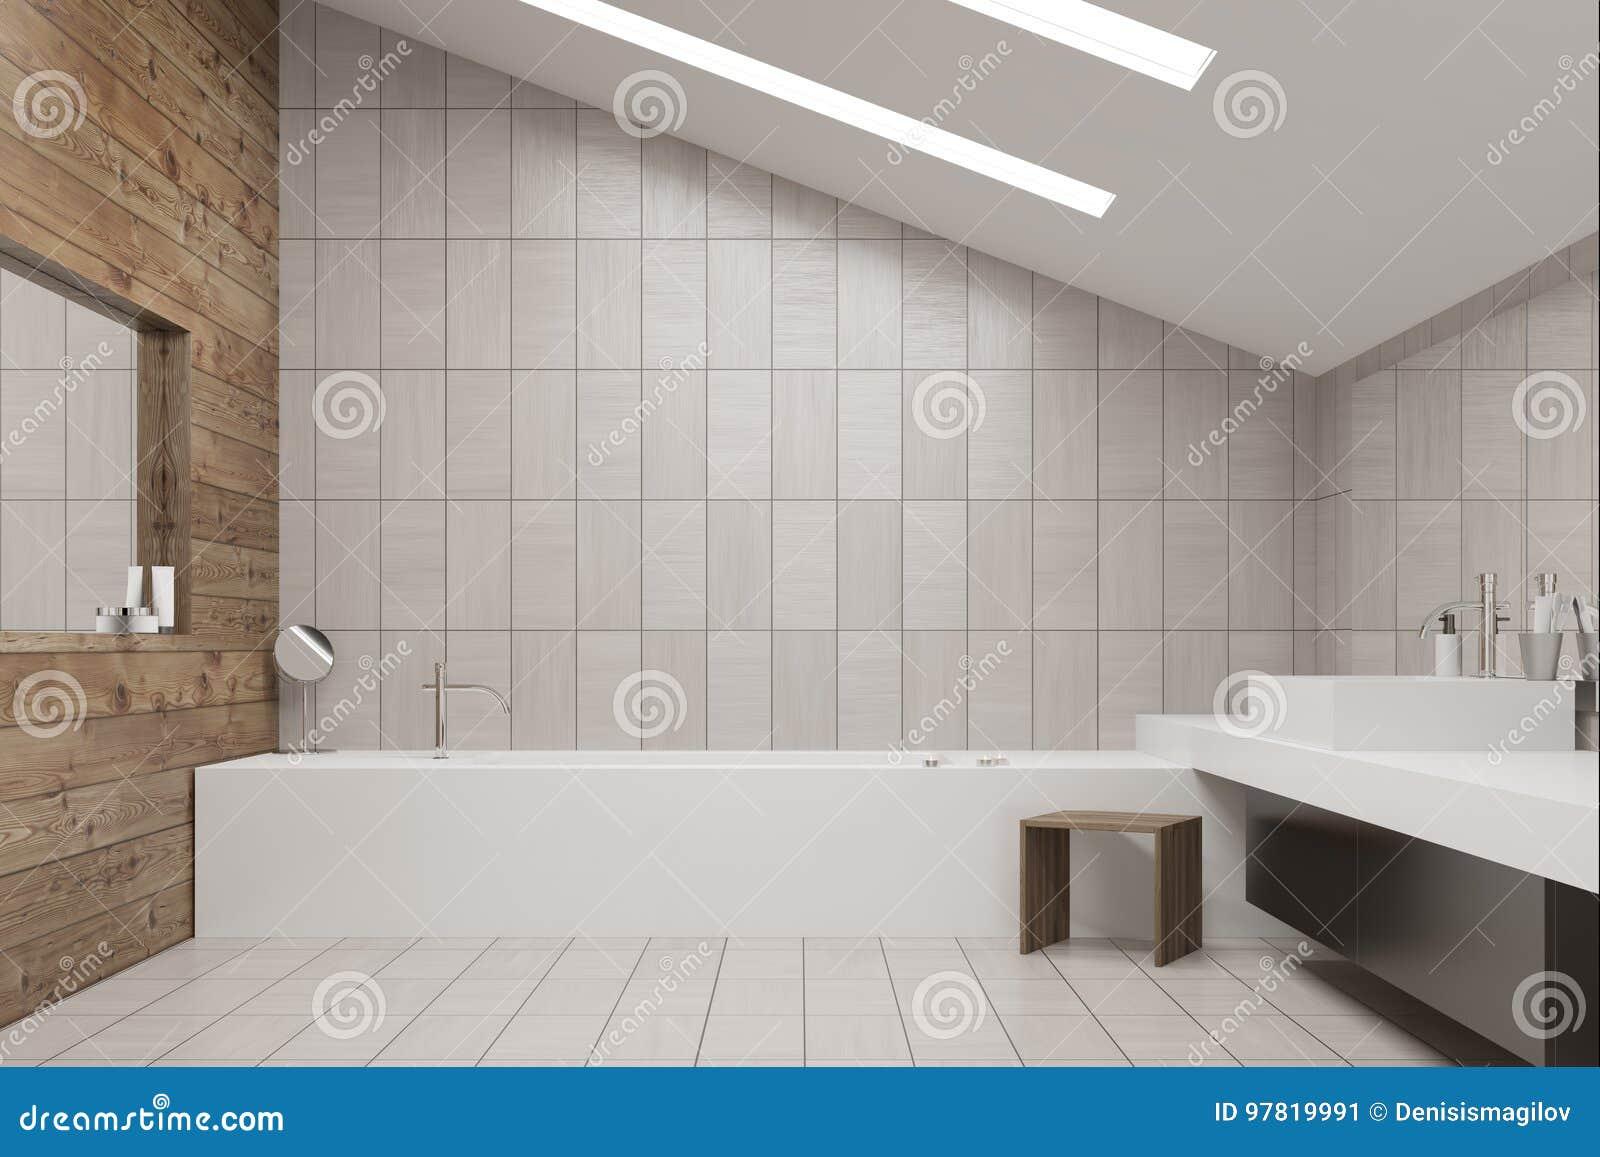 Tiled and wooden bathroom stock illustration. Illustration of design ...